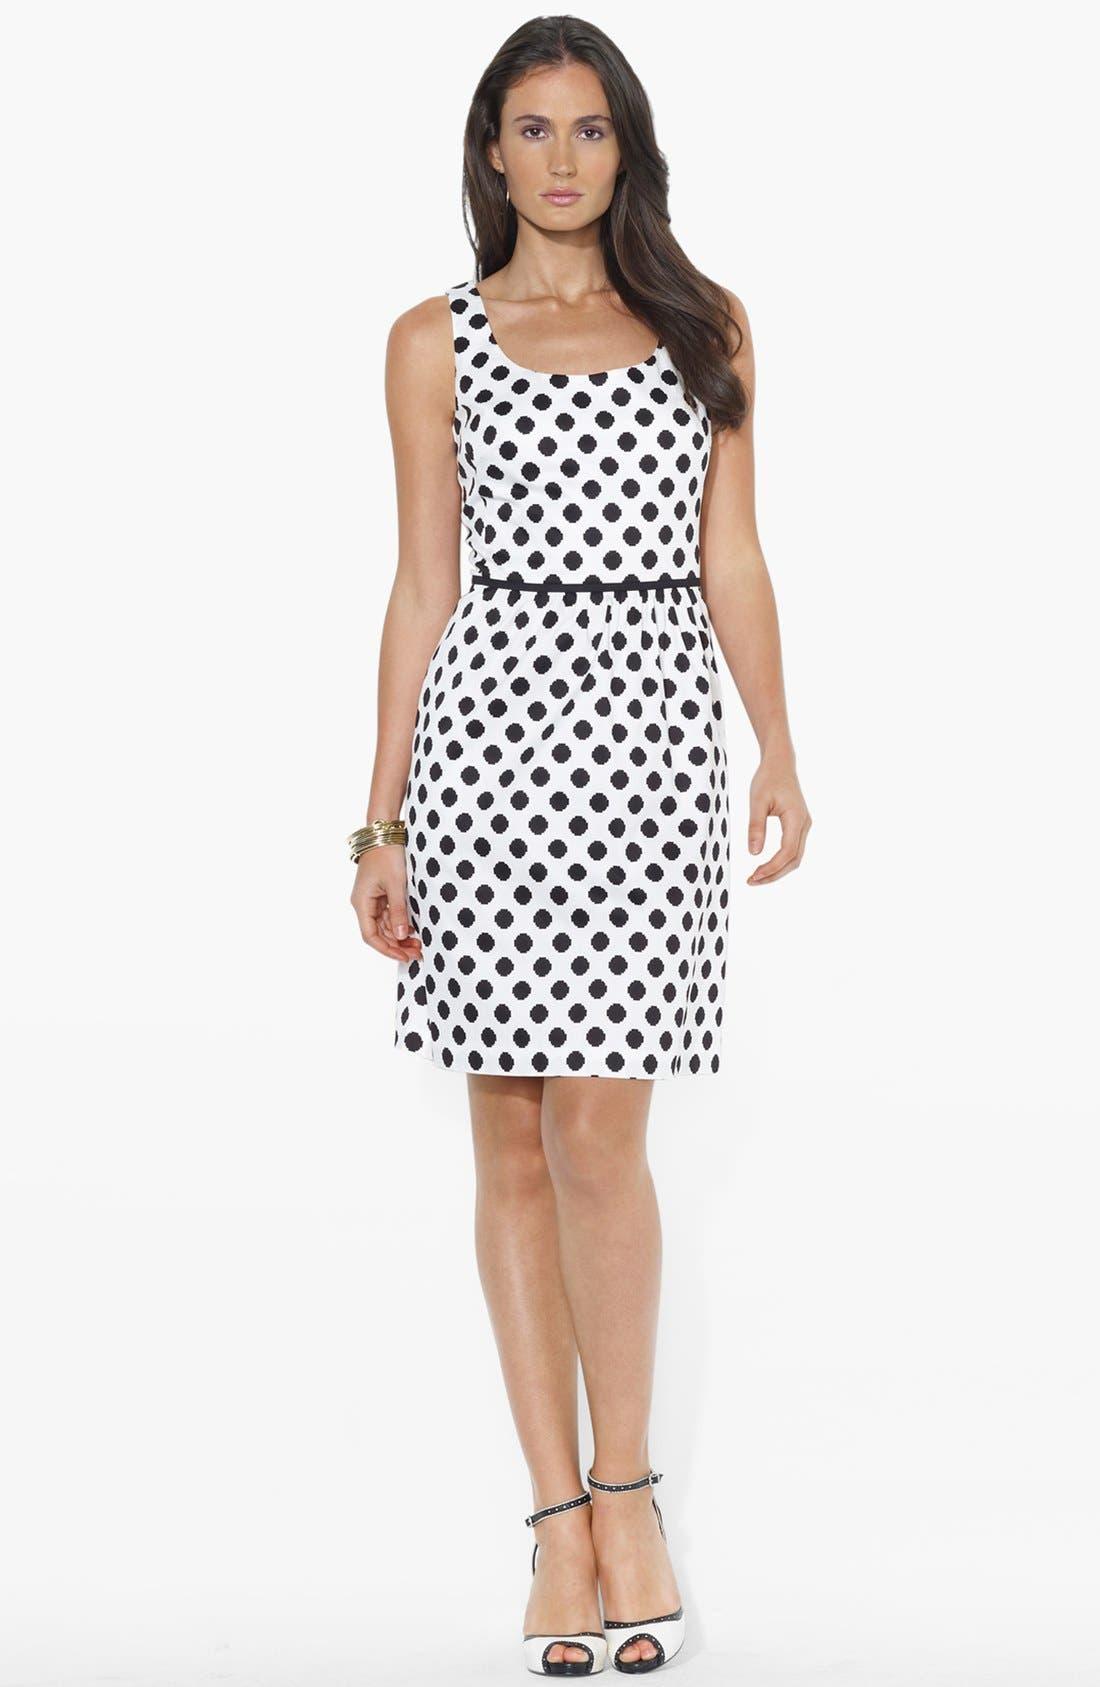 Alternate Image 1 Selected - Lauren Ralph Lauren Polka Dot Fit & Flare Dress